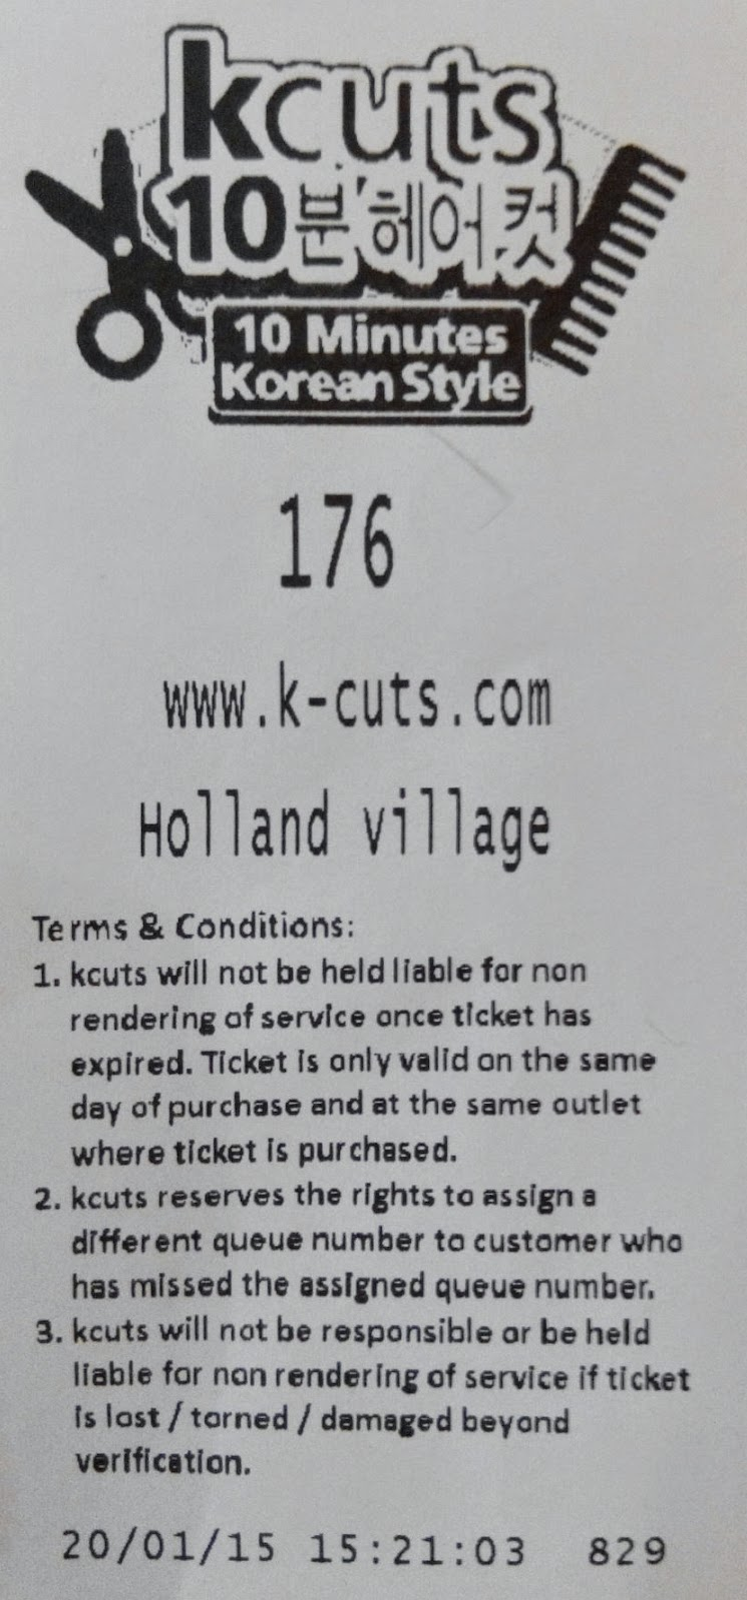 kcuts barbershop docket / receipt, Holland Village outlet, Singapore